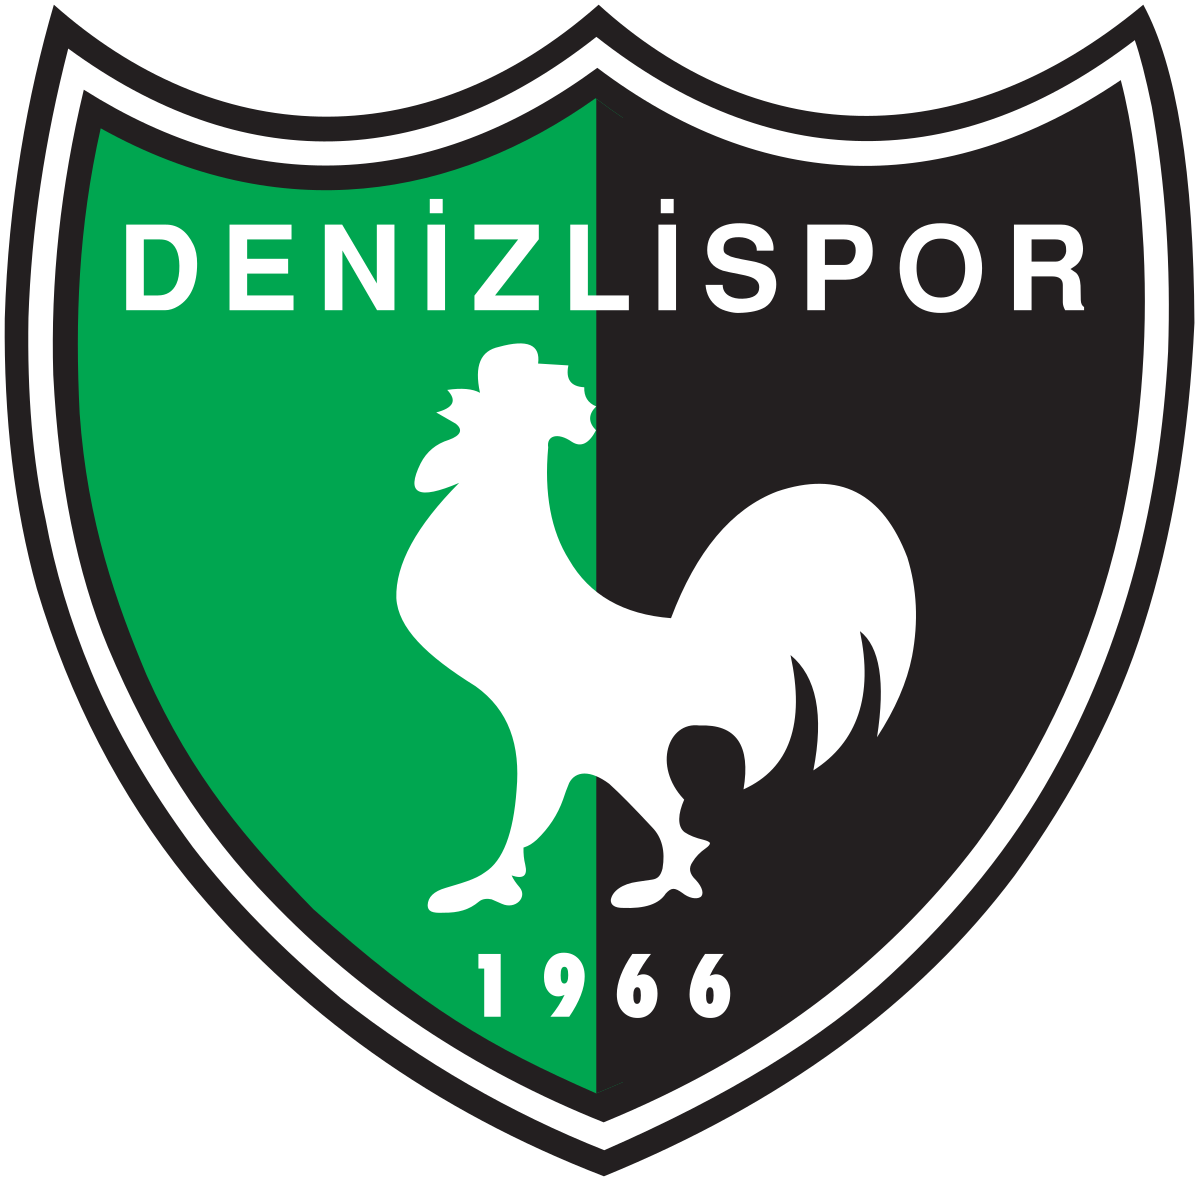 Places Denizlispor